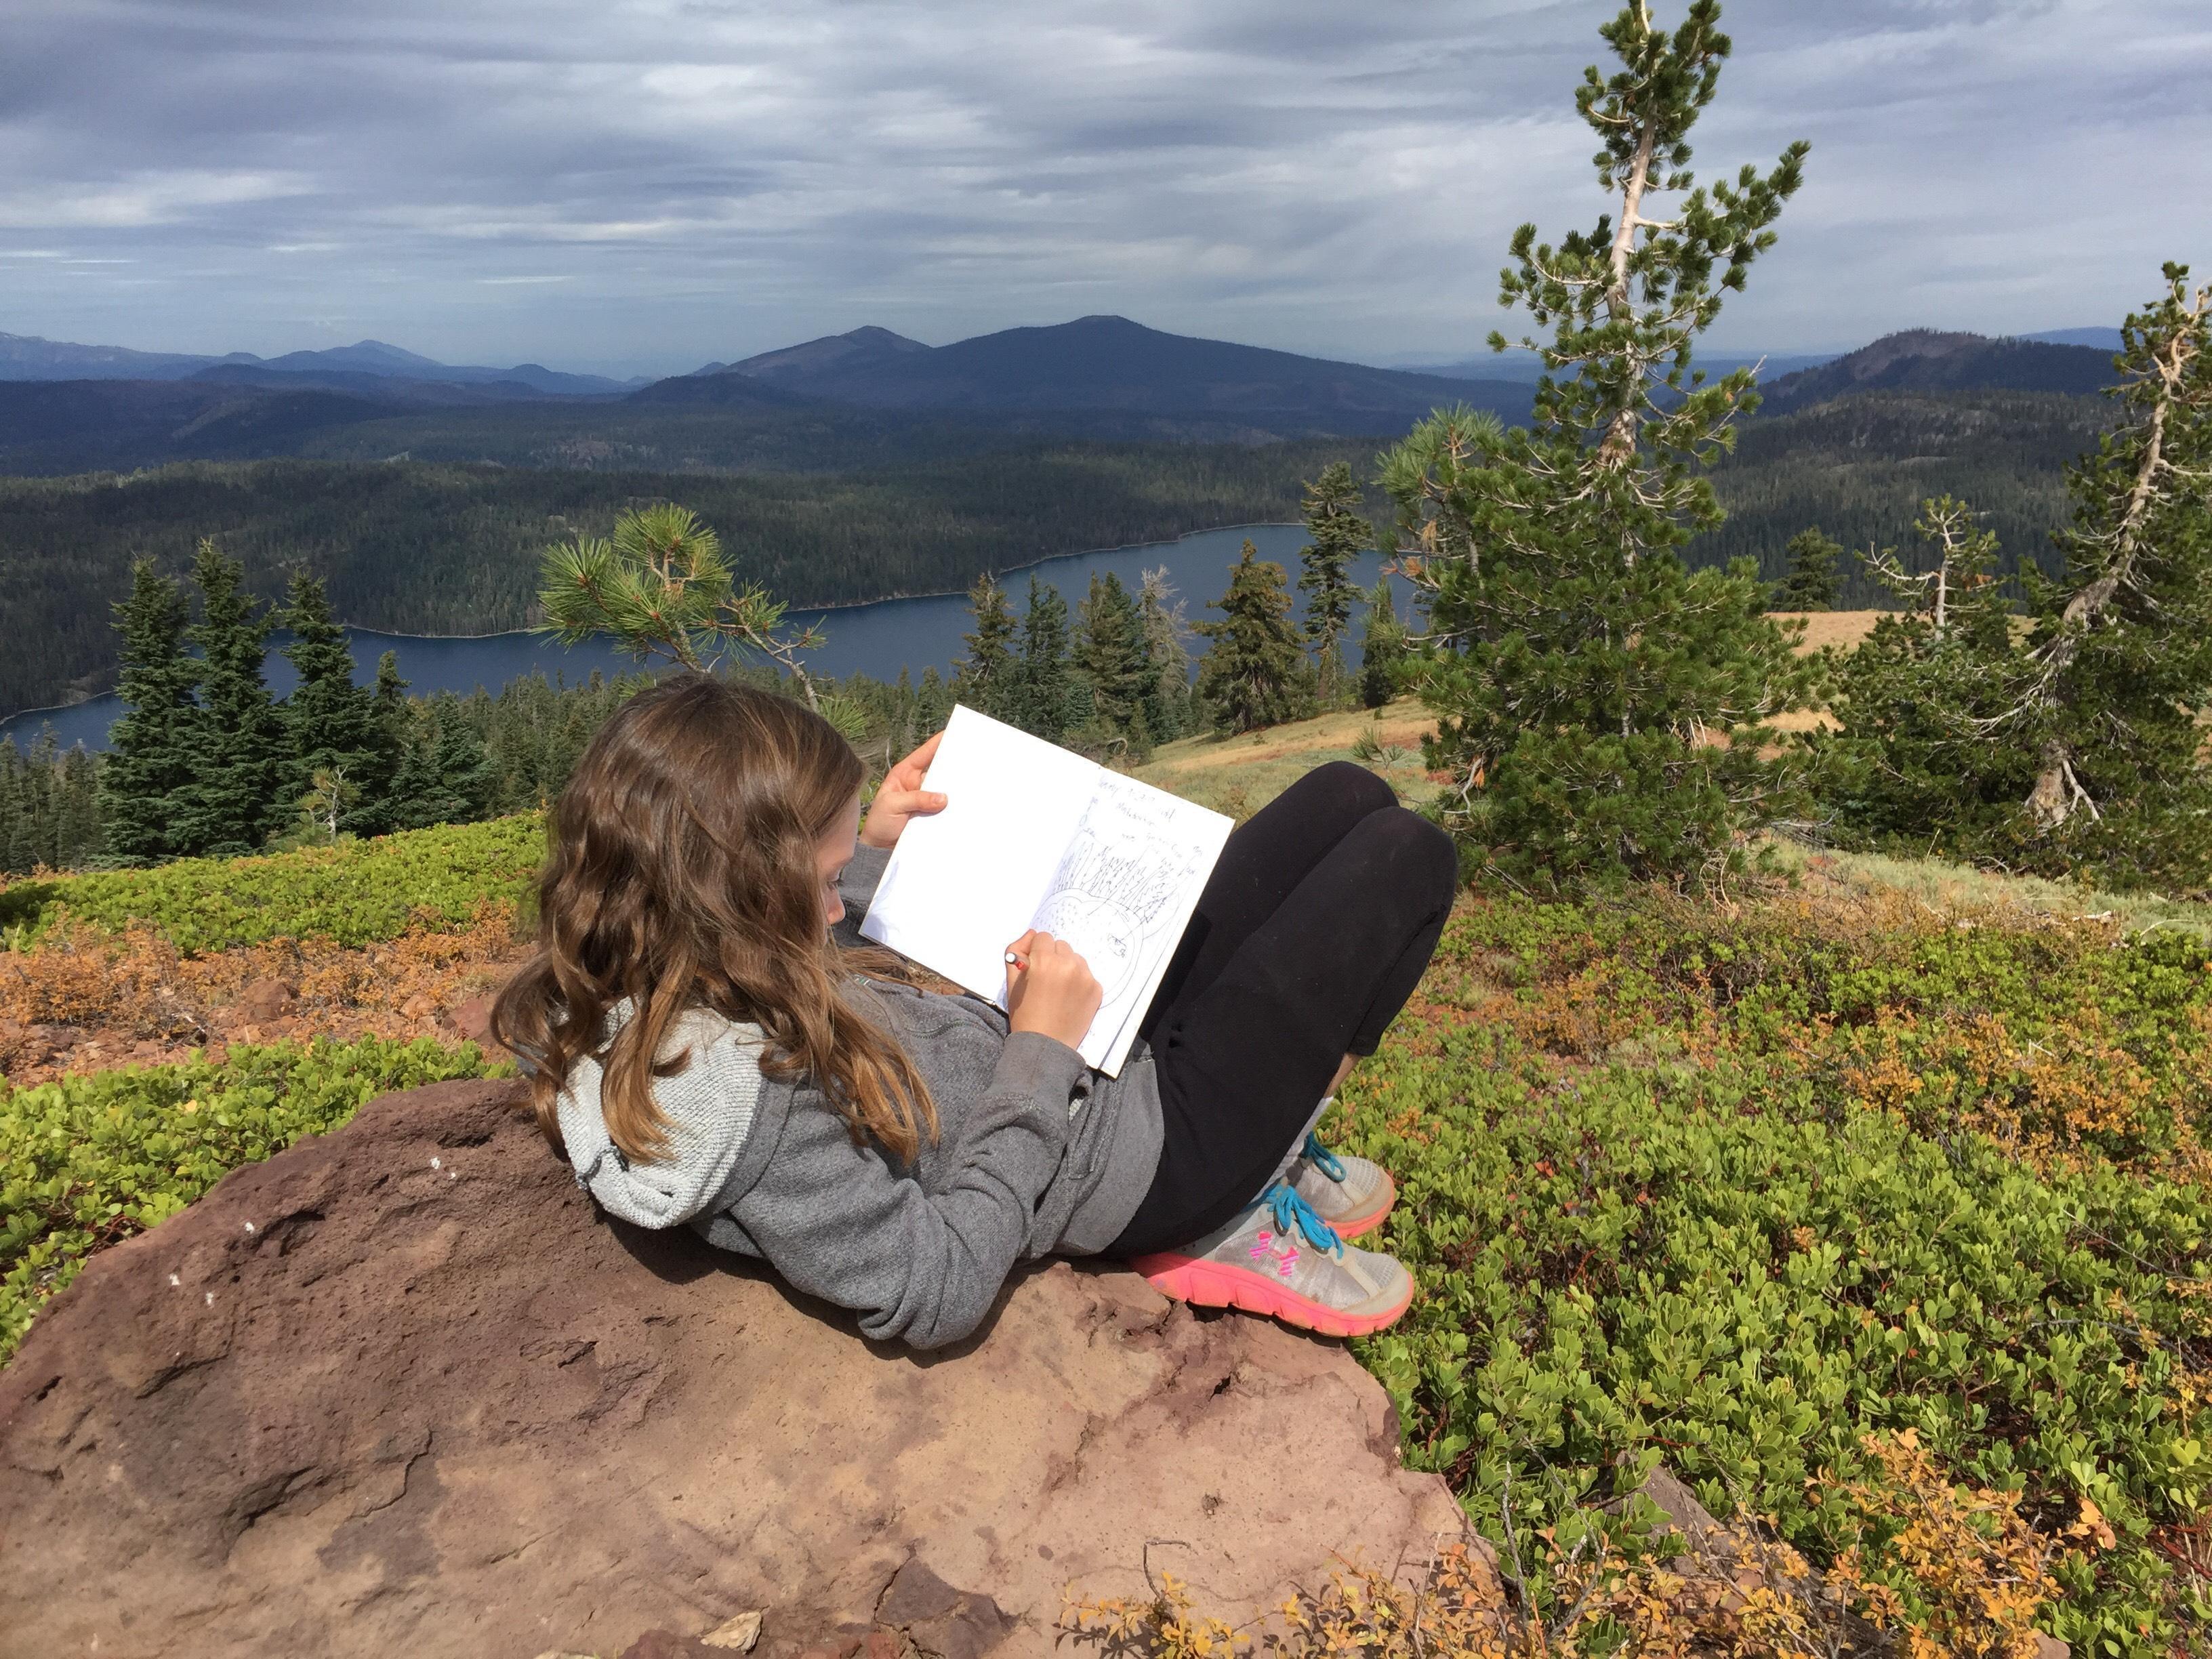 Child Reading on a Mountain